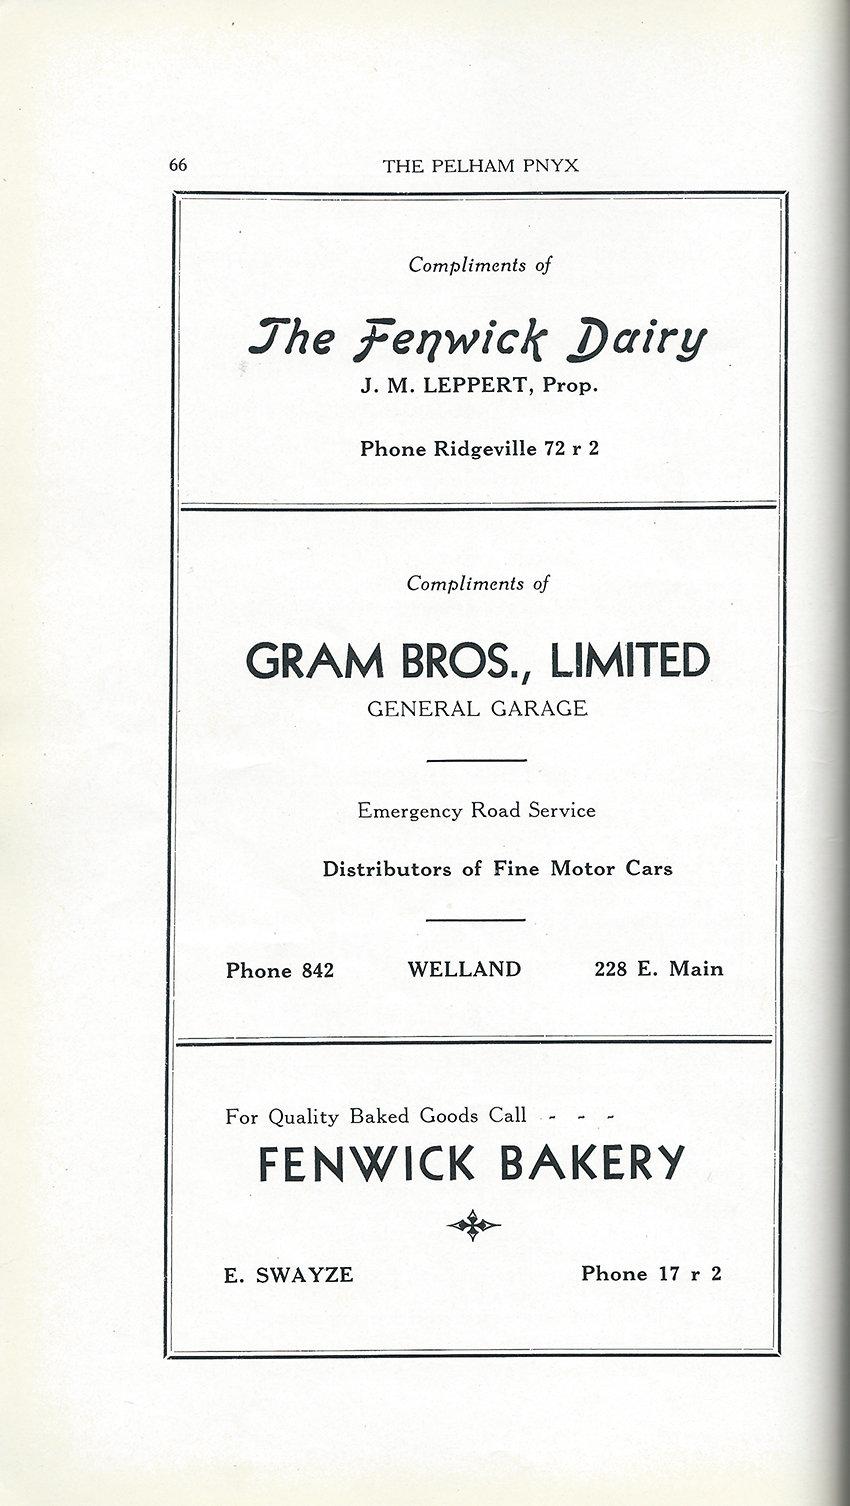 Pelham Pnyx Advertisements - The Fenwick Dairy, Gram Bros. Limited General Garage, and Fenwick Bakery